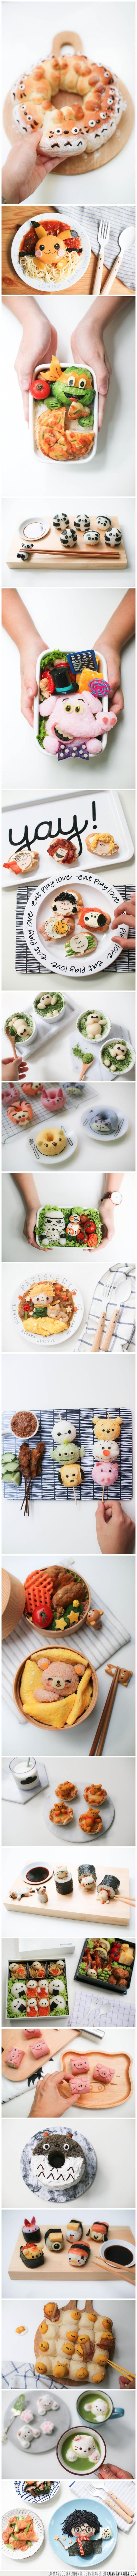 adorable,baymax,bento,comida,disney,gato,harry potter,kawaii,obento,sushi,te